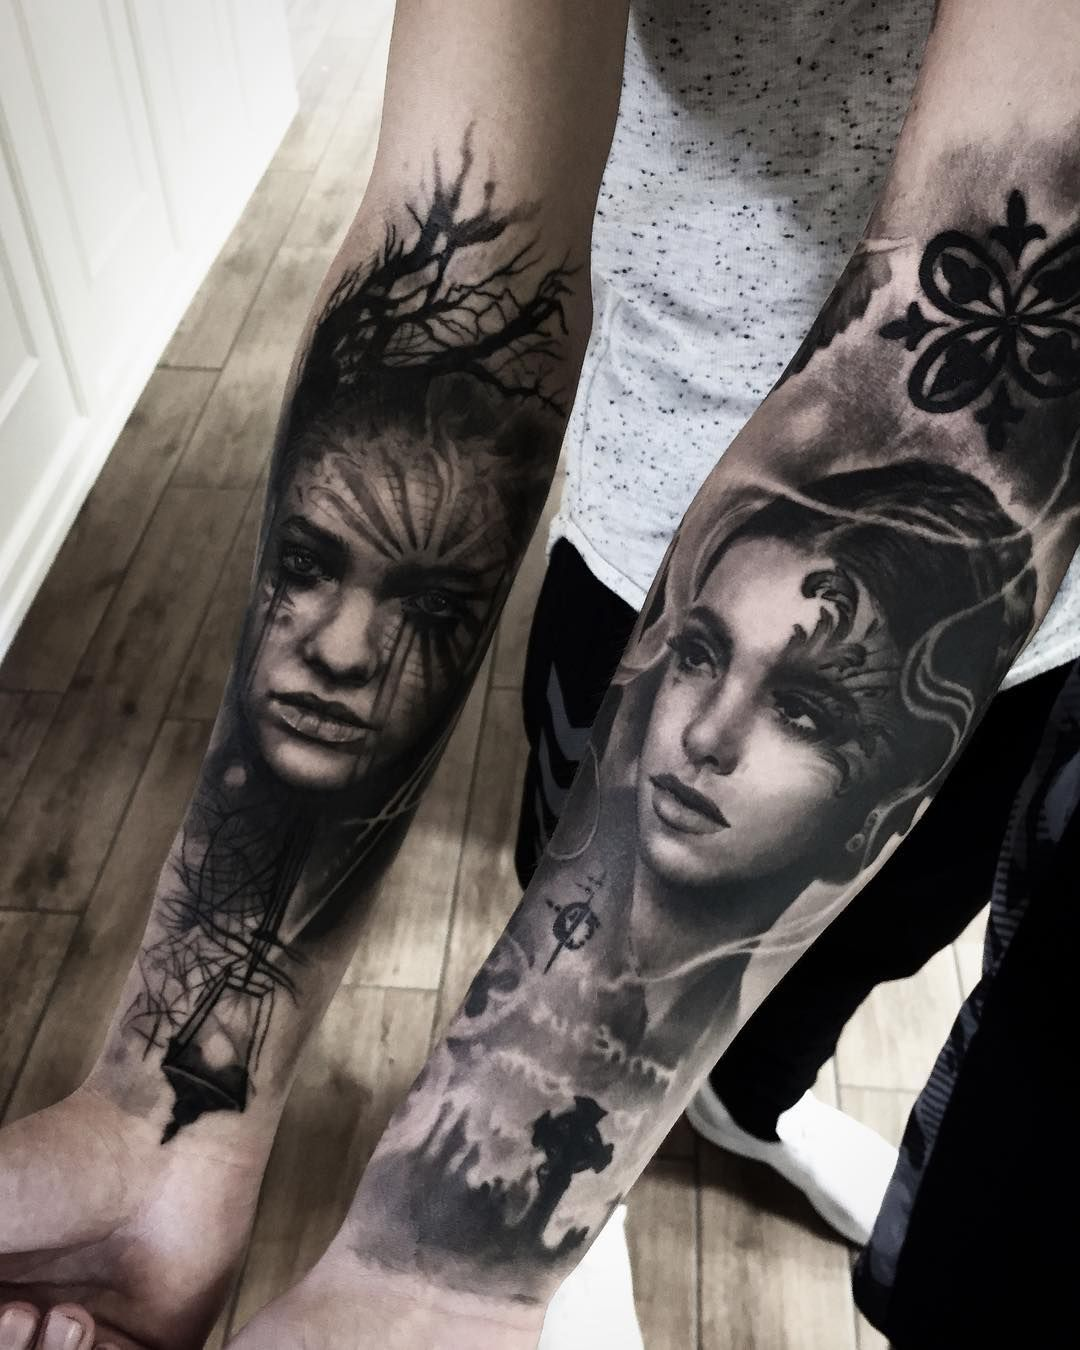 Catalogo Tattoo 2017 mark wosgerau instagram | tattoo ideen, ganzarm-tattoos